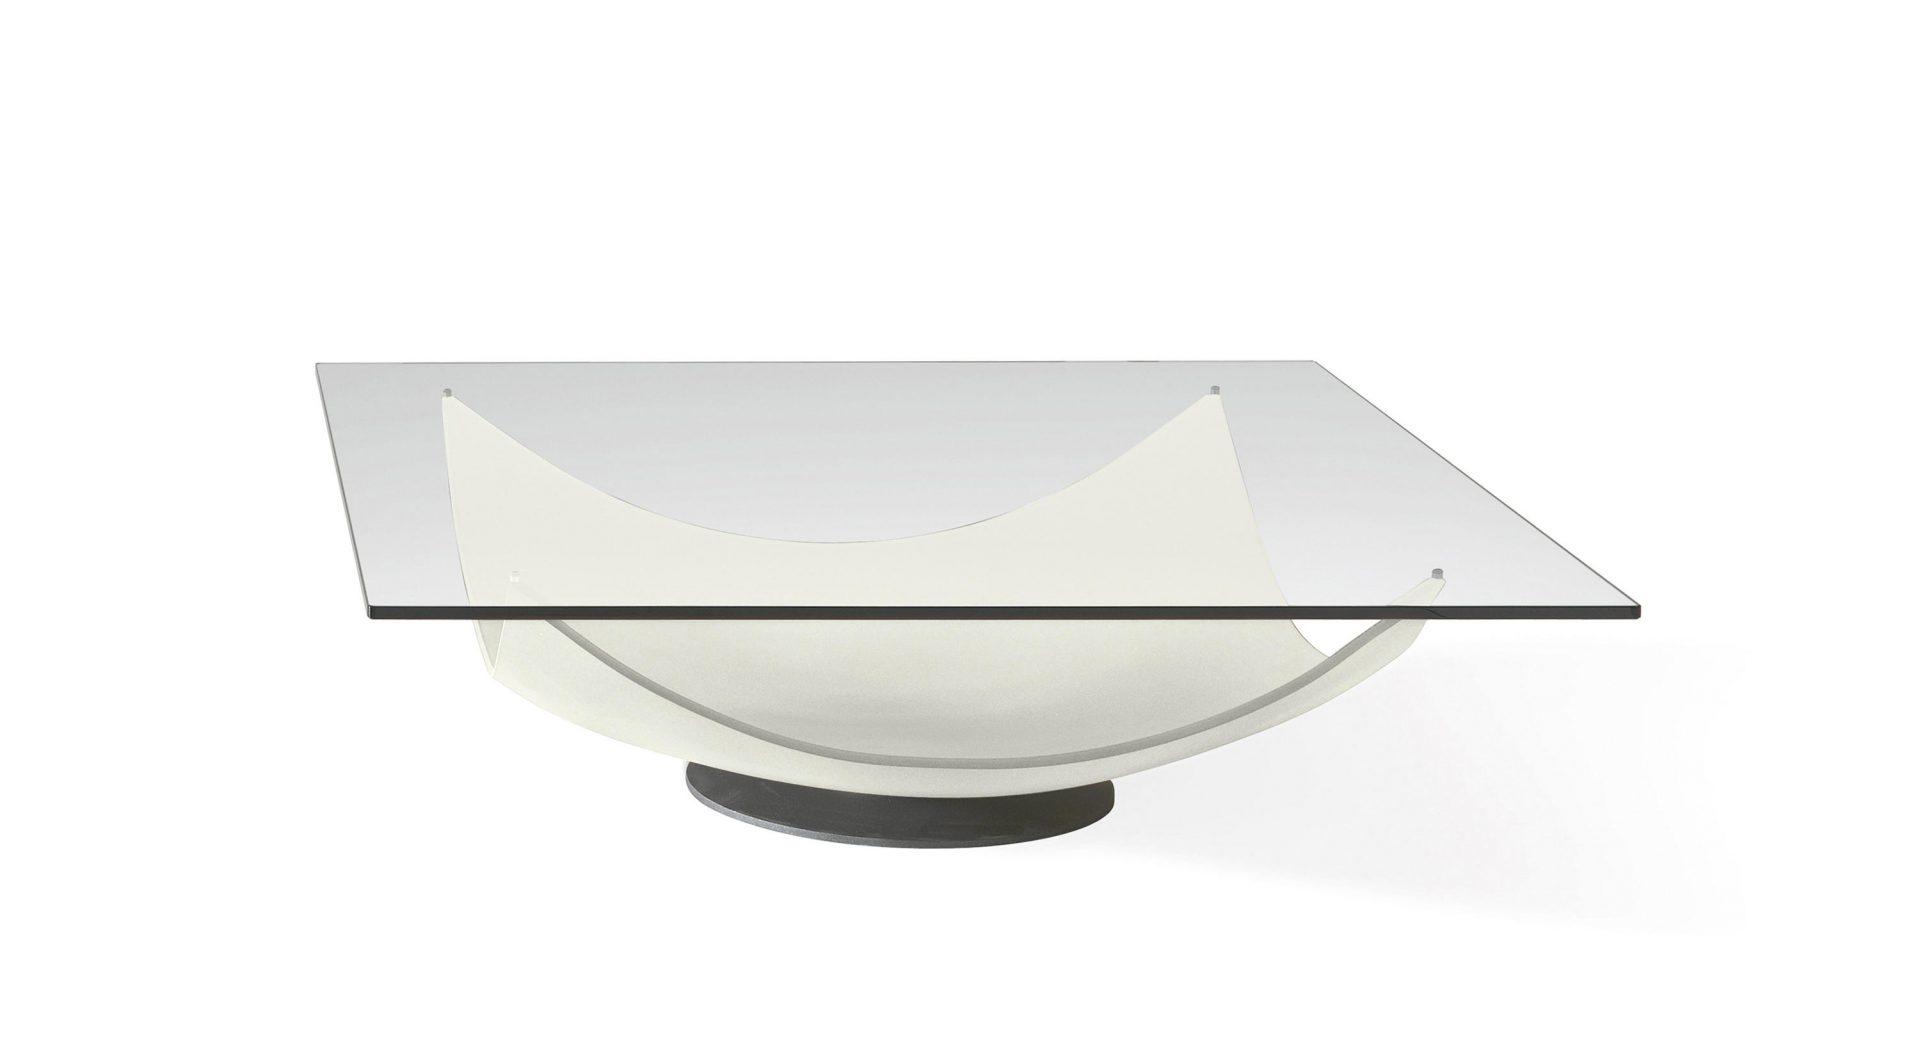 Vela Coffee Table